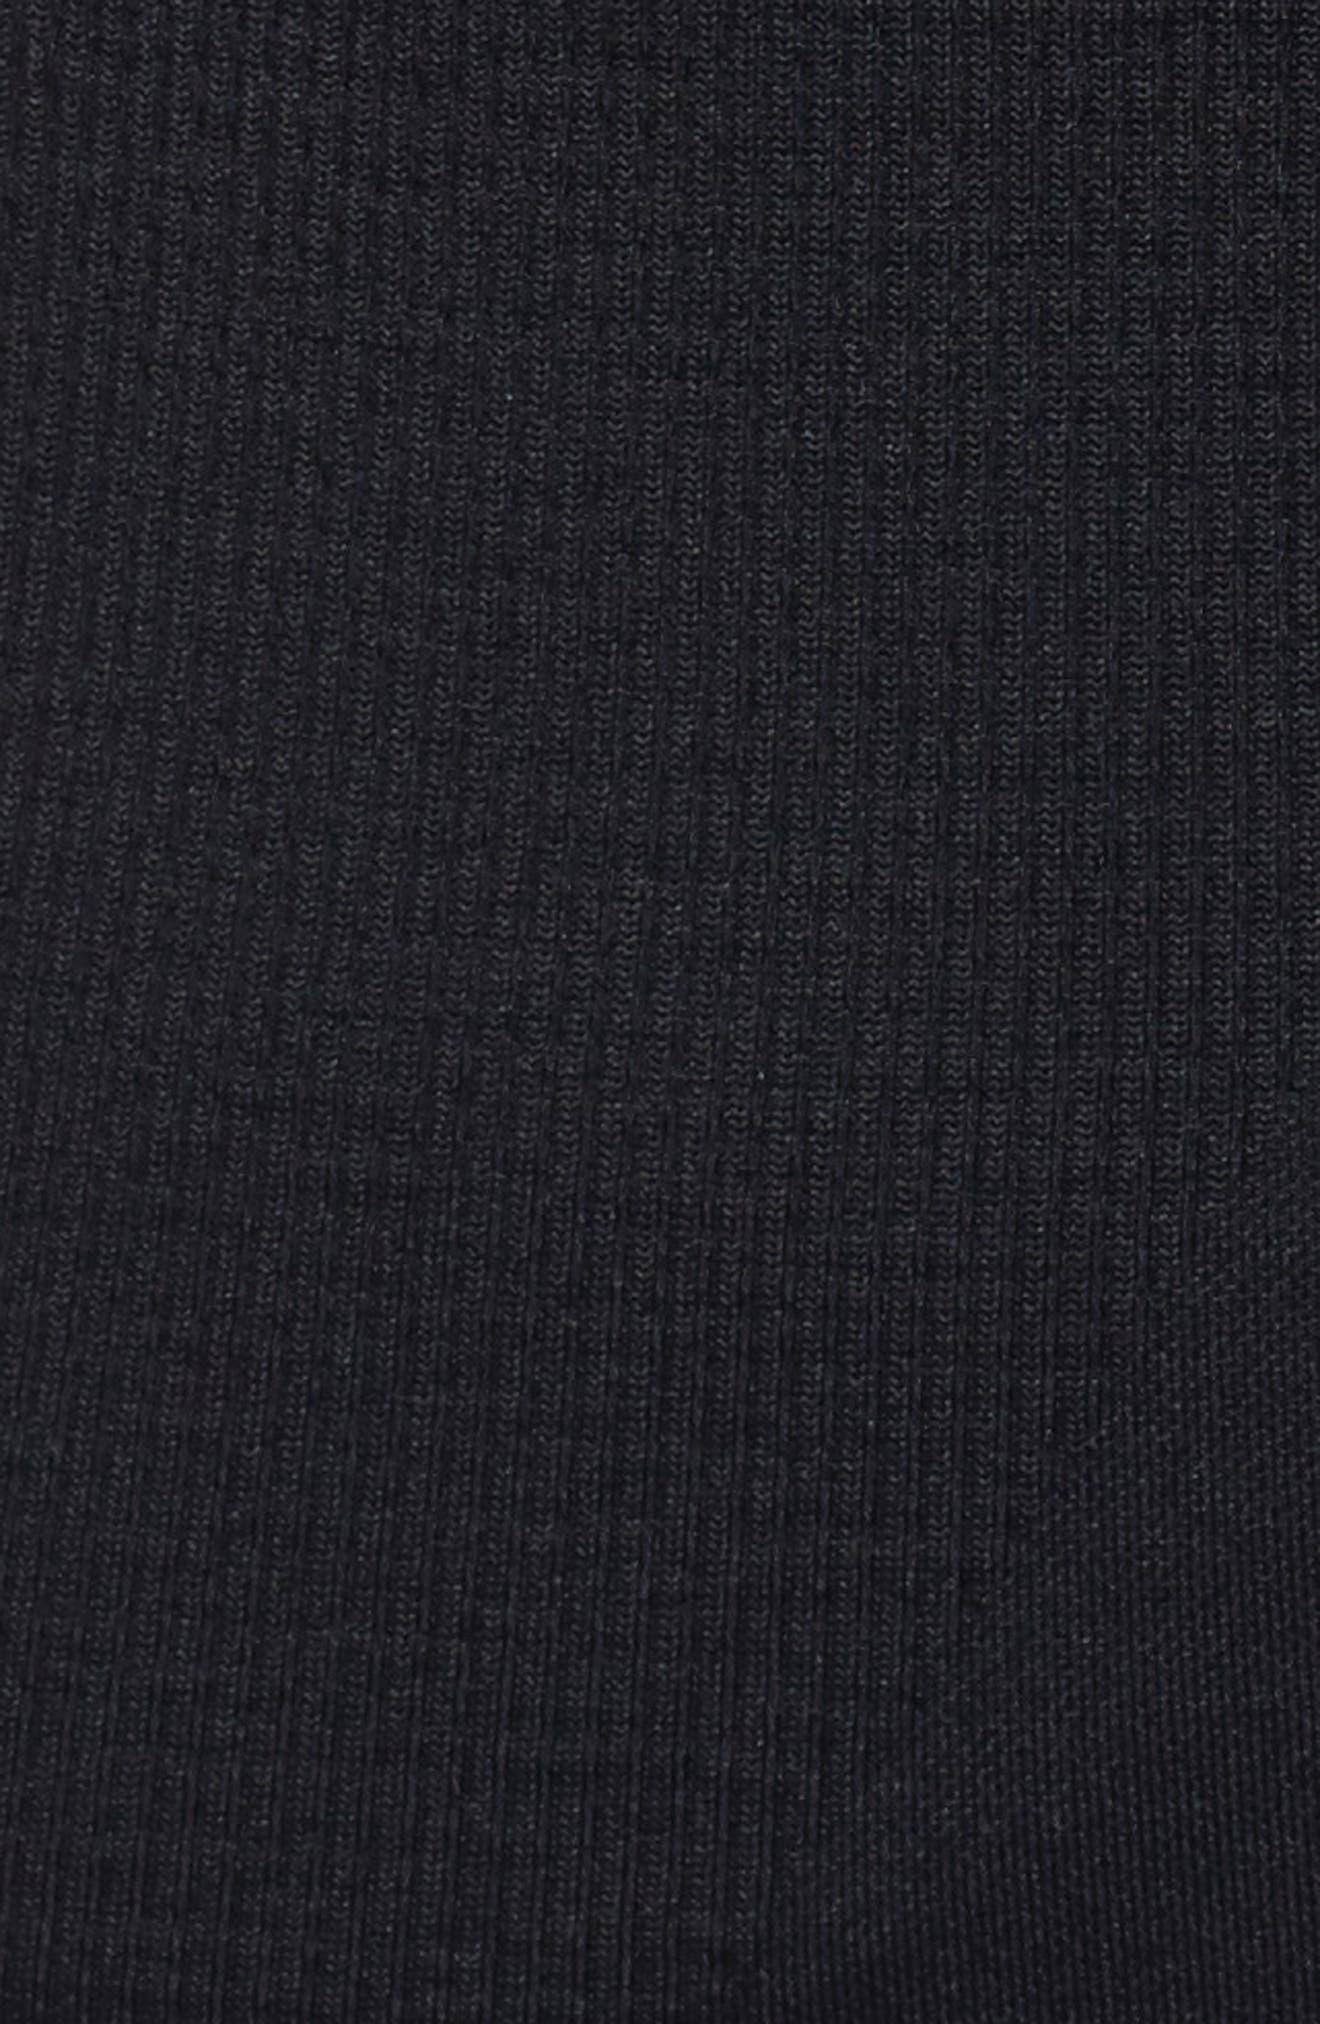 Blackout Jacket,                             Alternate thumbnail 6, color,                             Black